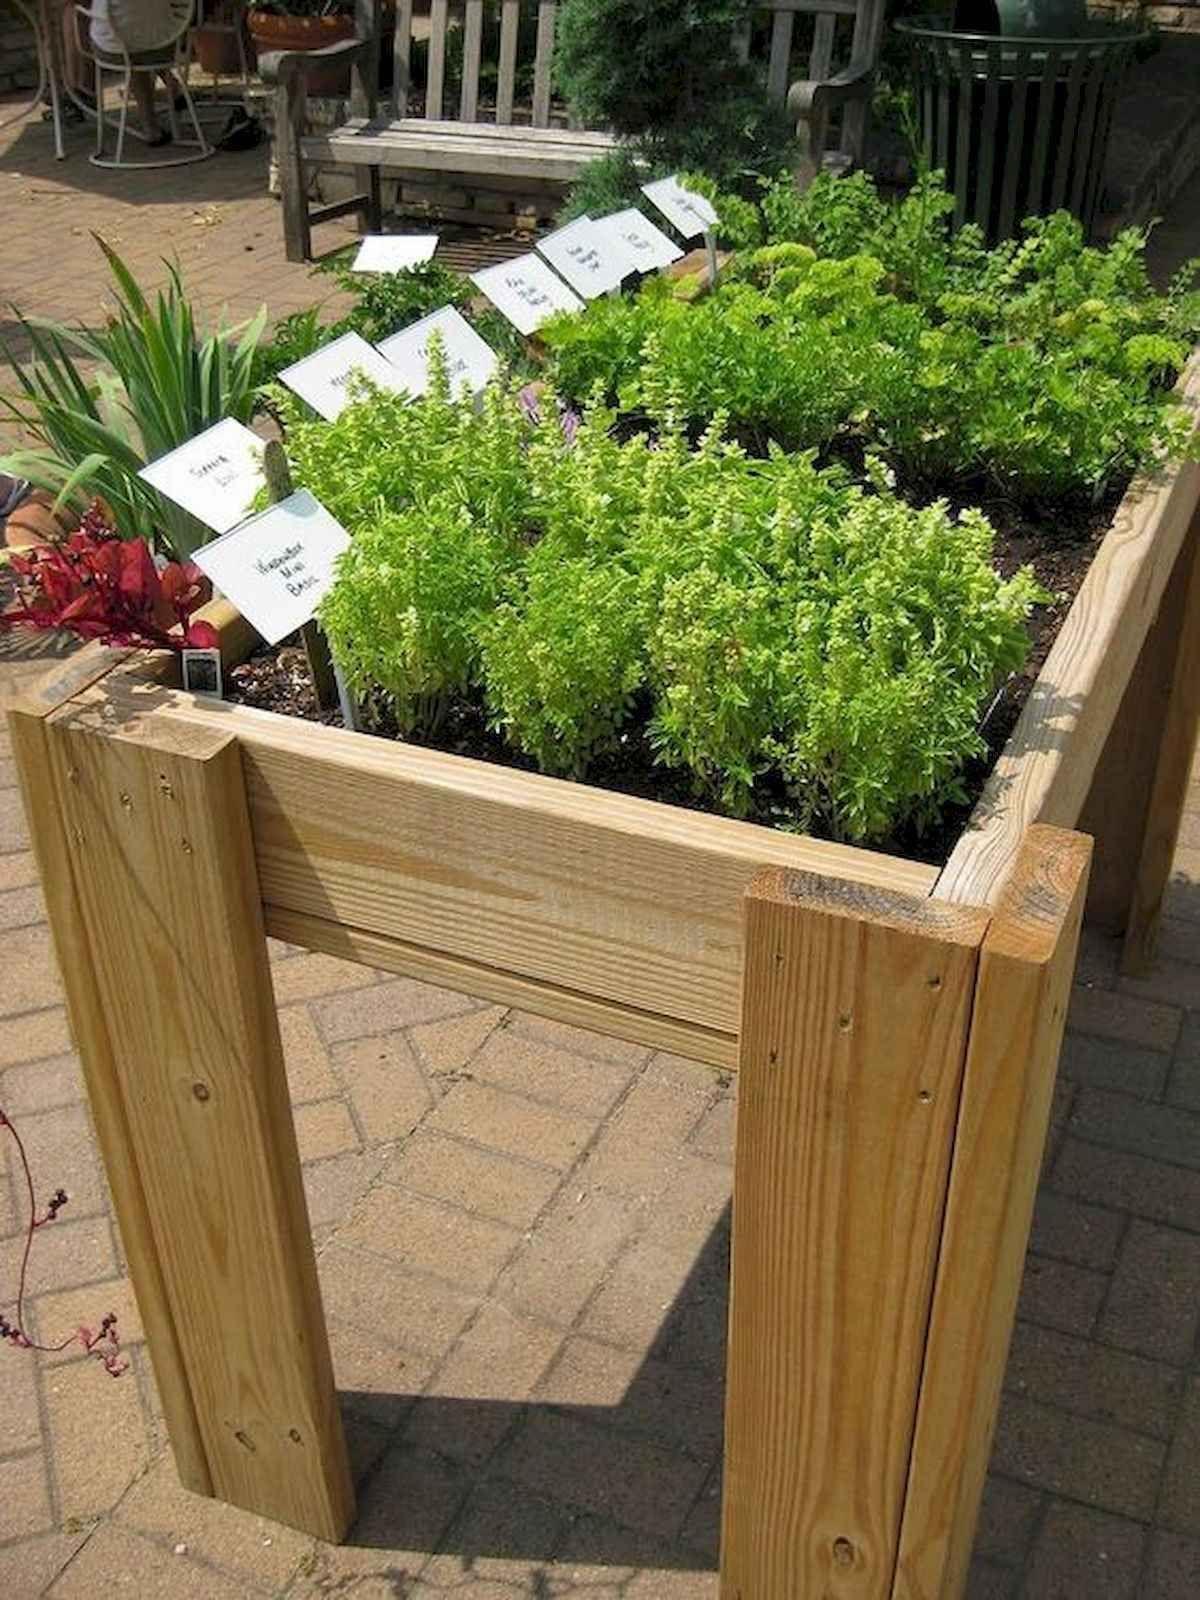 55 Favorite Garden Boxes Raised Design Ideas 36 Vegetable Garden Raised Beds Diy Garden Bed Vegetable Garden Beds